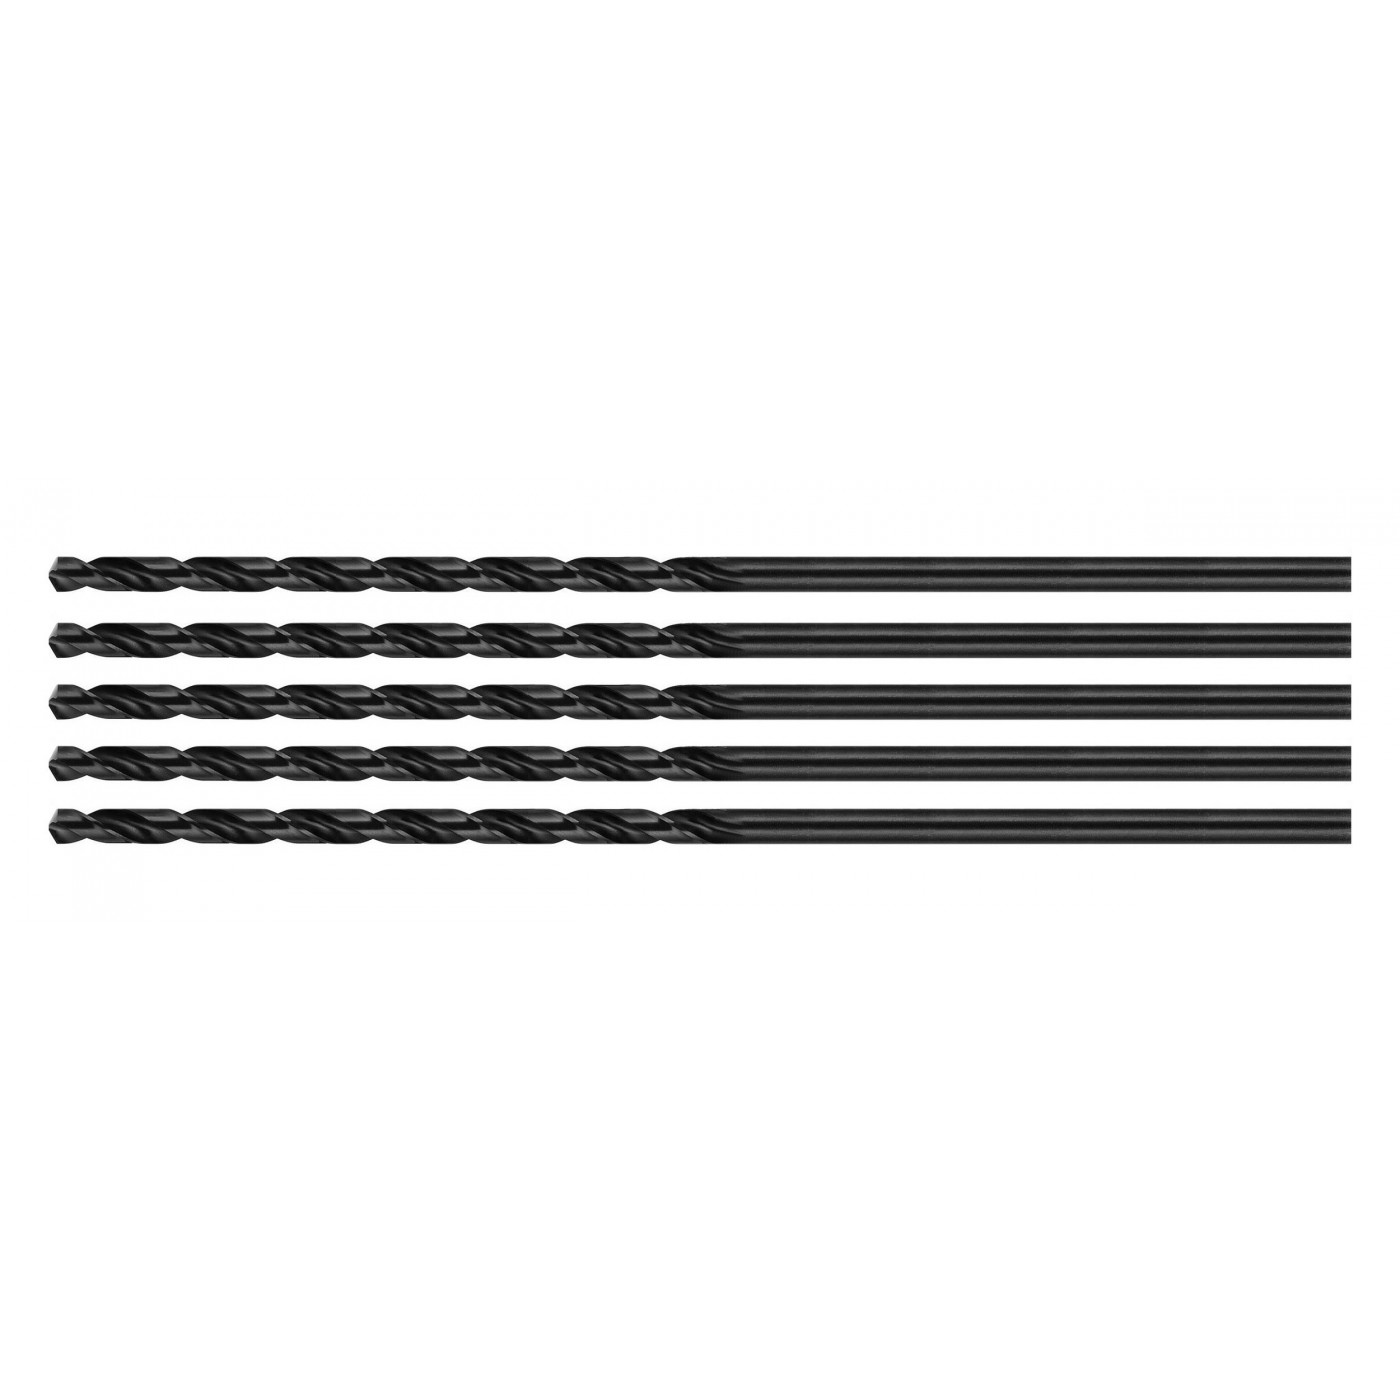 Set of 5 metal drill bits, extra long (4.5x300 mm)